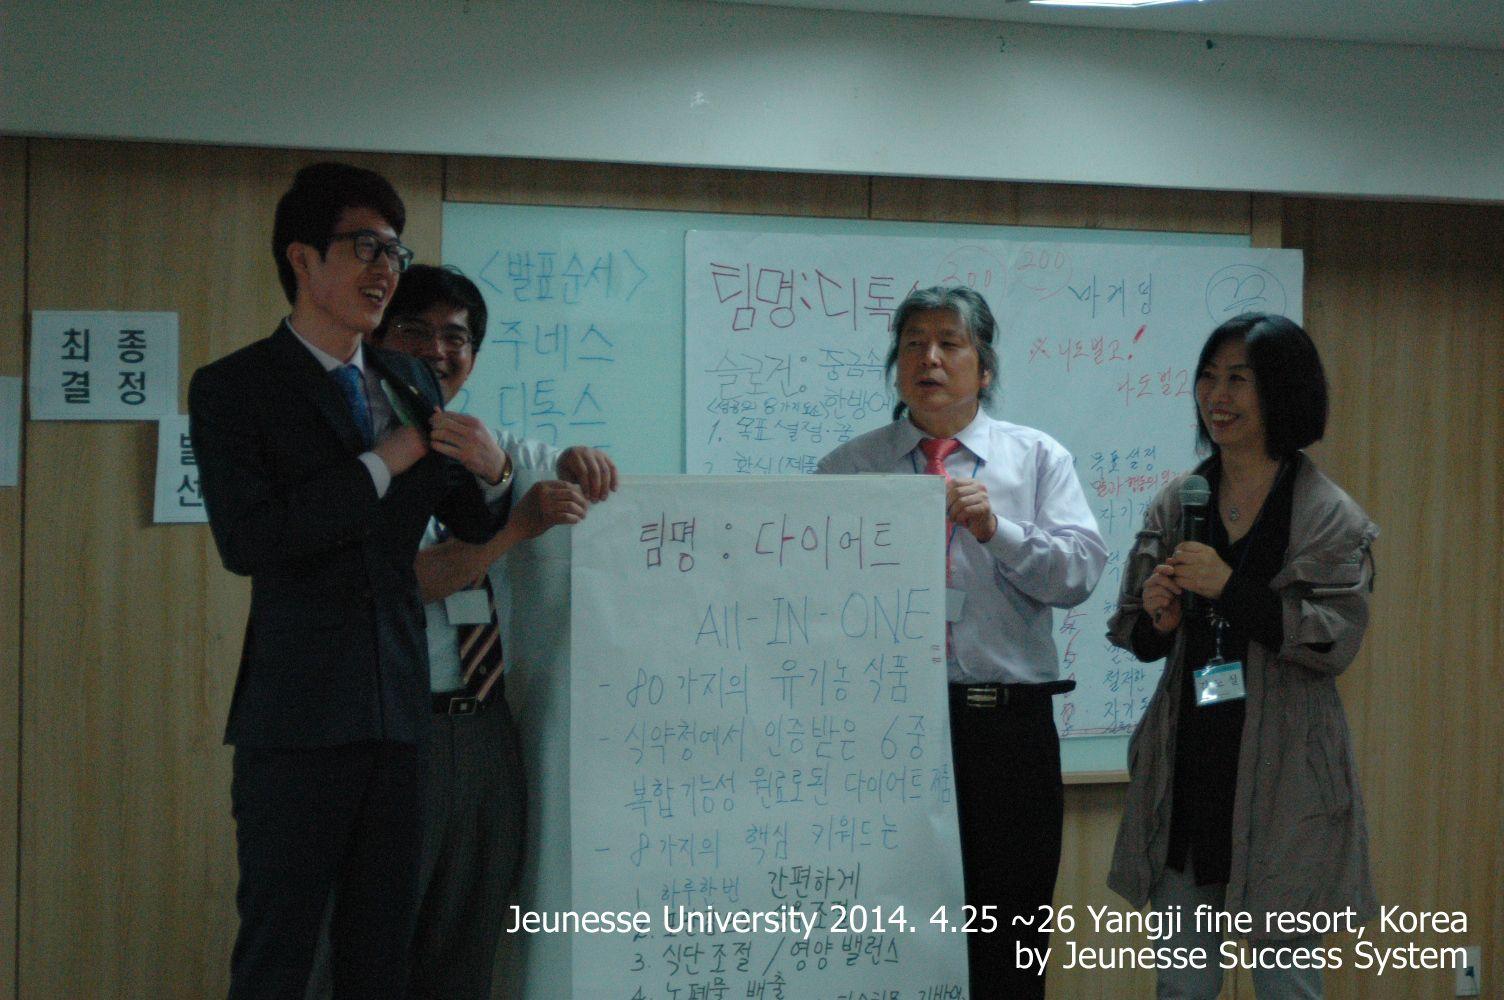 Jeunesse University 2014.4.25~26, Yanggi fine Resort, Korea - Jeunesse Success System  주네스유니버시티 양지파인리조트에서 - 다이어트팀 발표